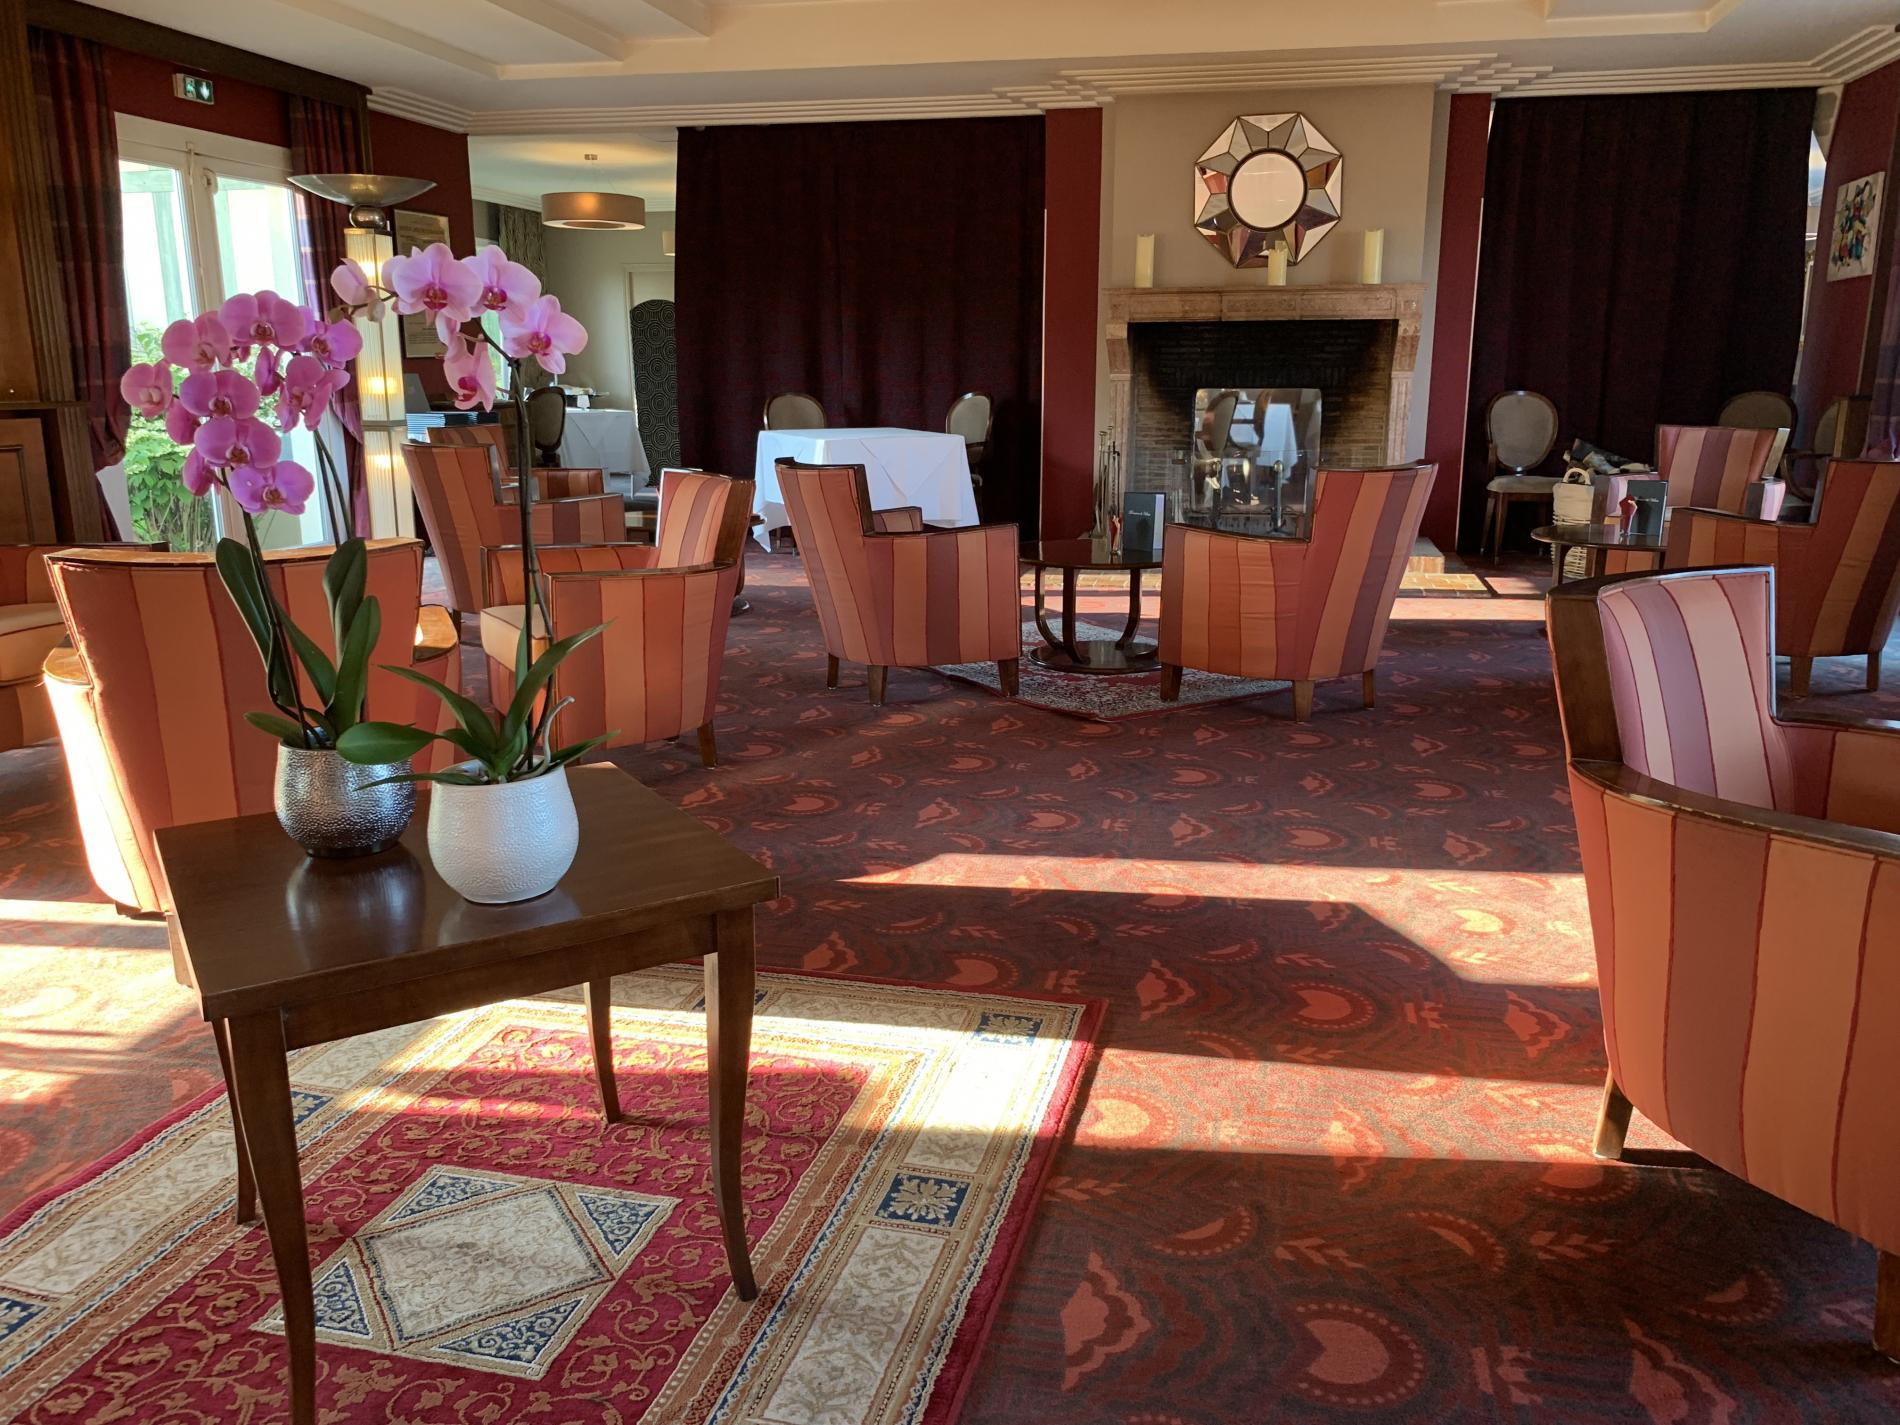 ∞ Hotel Deauville – Hôtel Restaurant Vue Mer Avec Piscine ... concernant Horaires Piscine Deauville